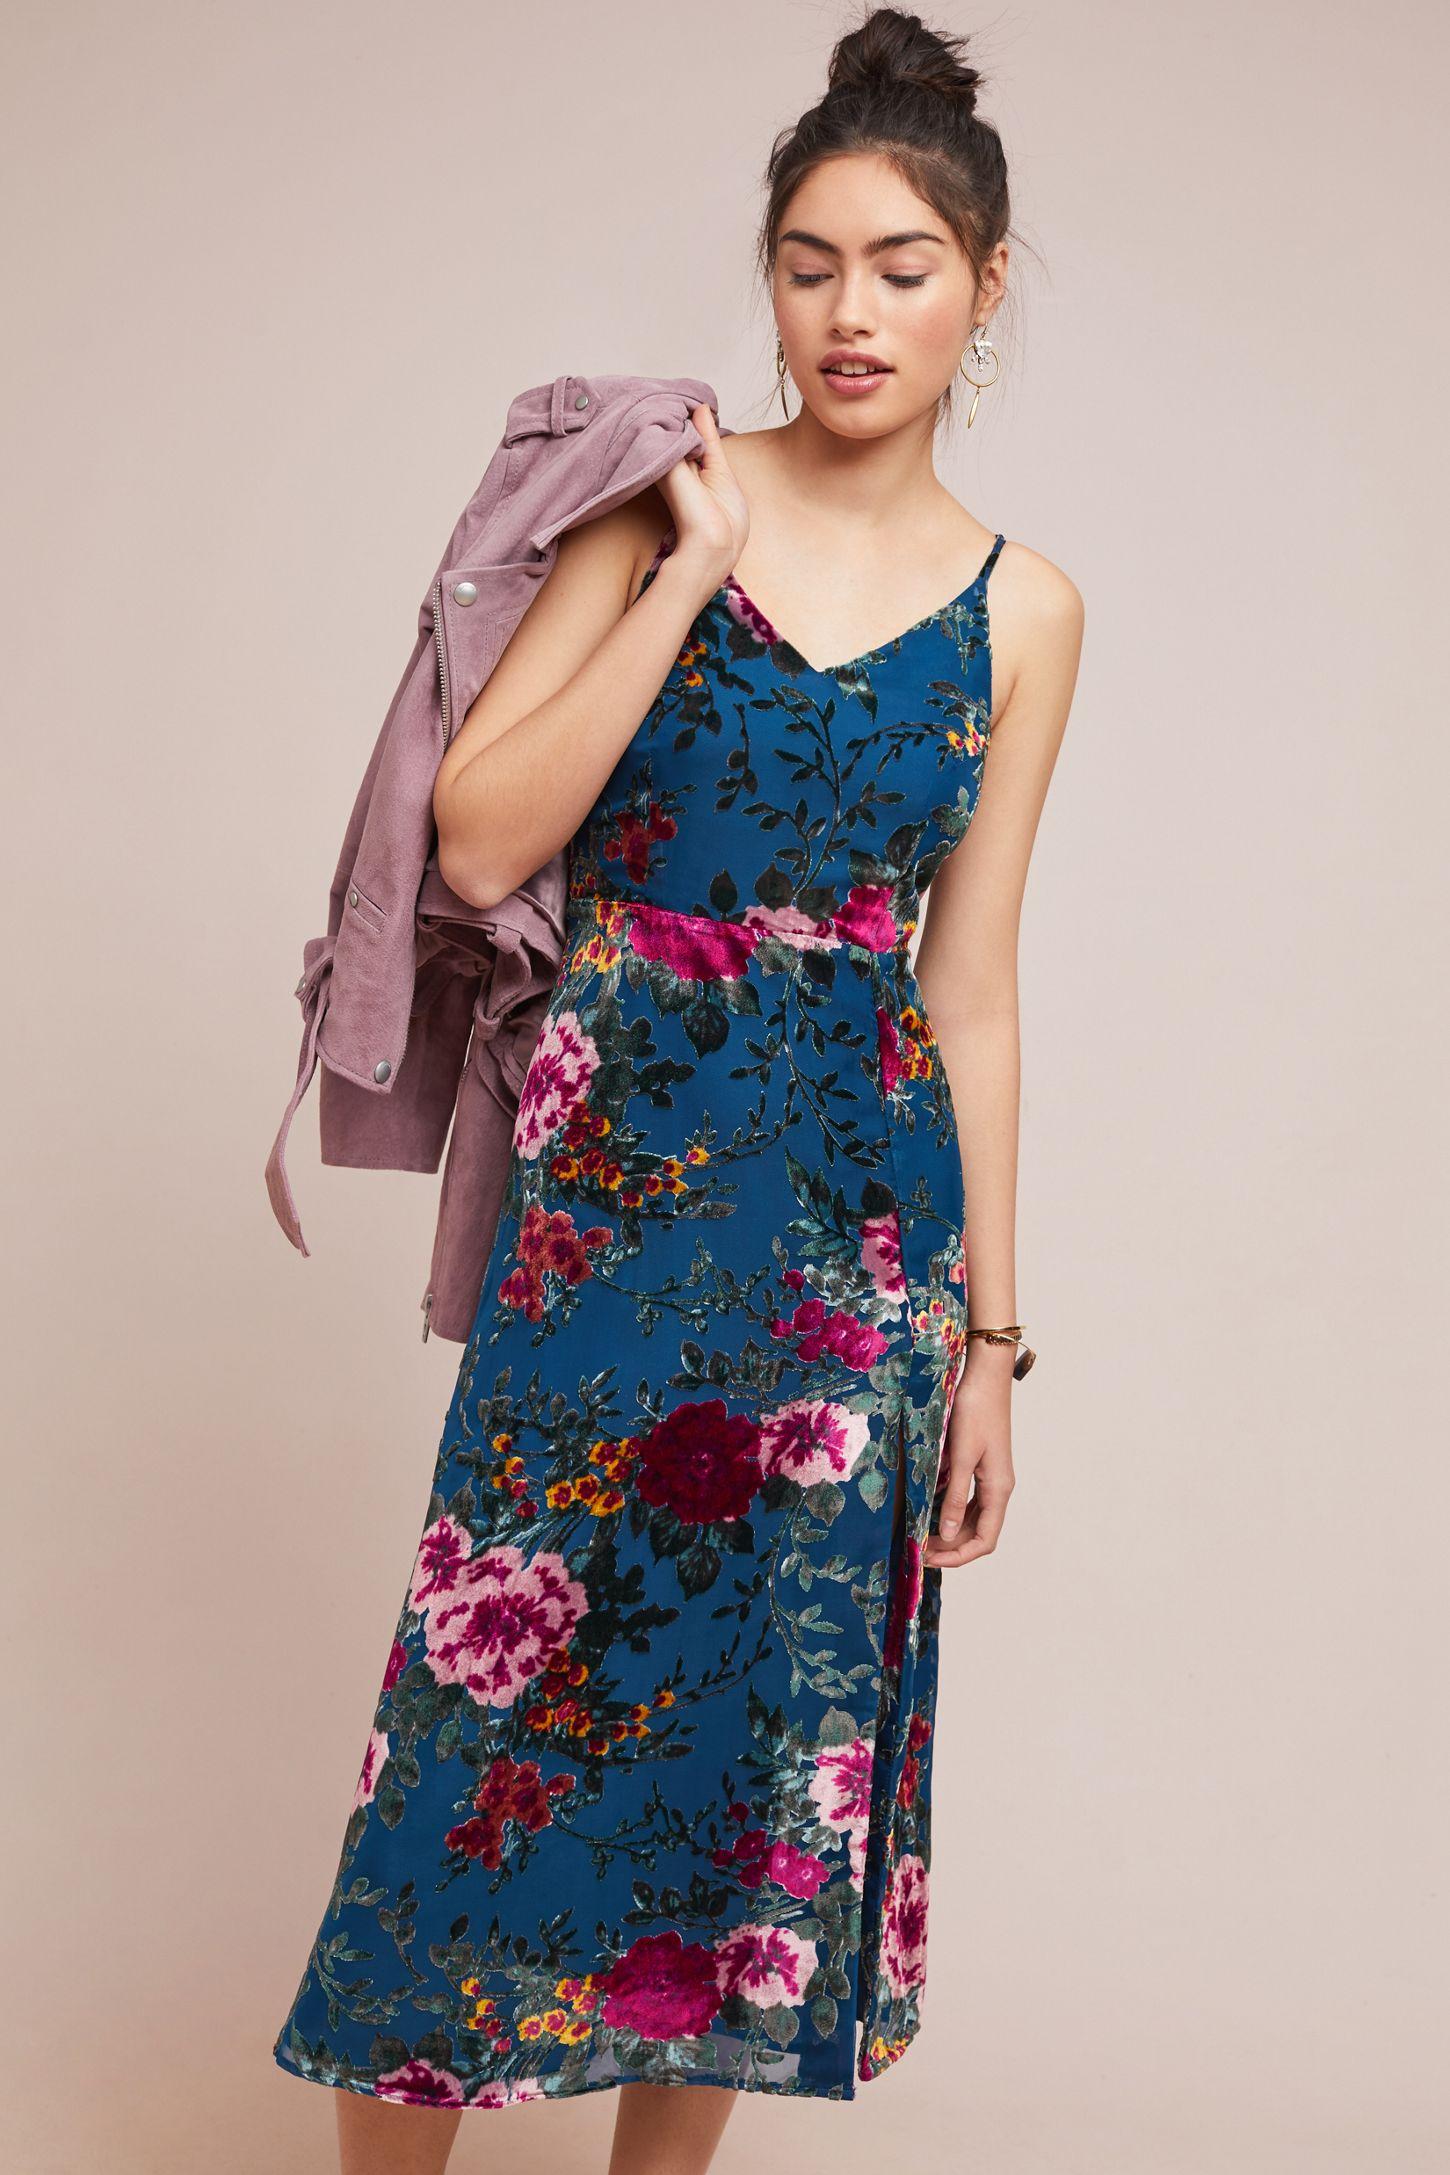 5c5e38543f4 Yumi Kim Socialite Floral Dress